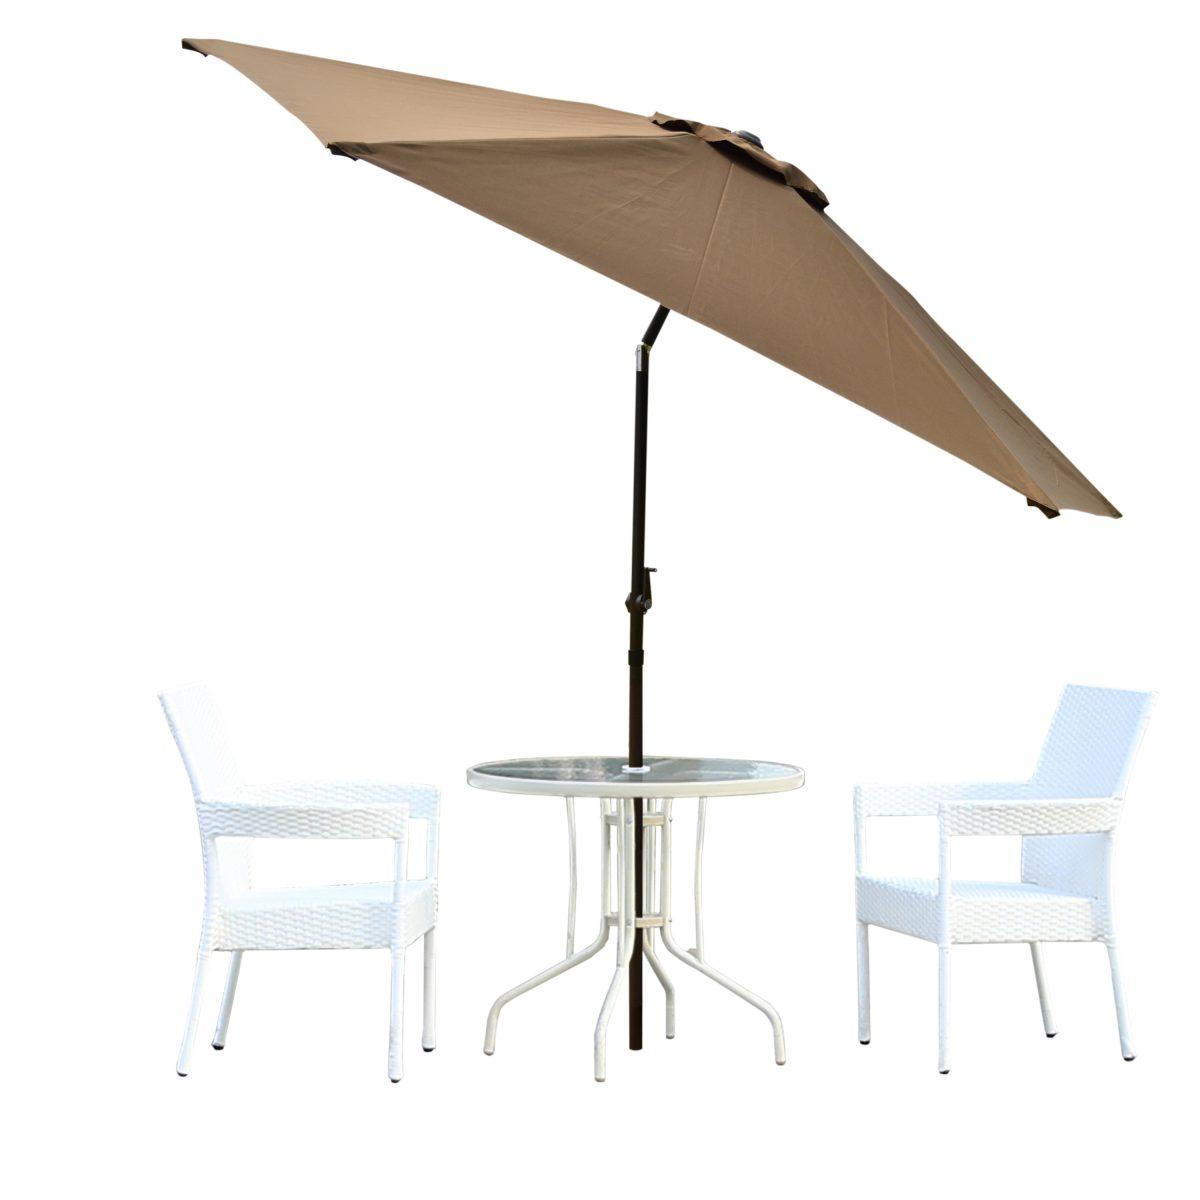 Charmant Borealis Malta 9 Foot Coffee Patio Umbrella With Vented Top Tilt Crank